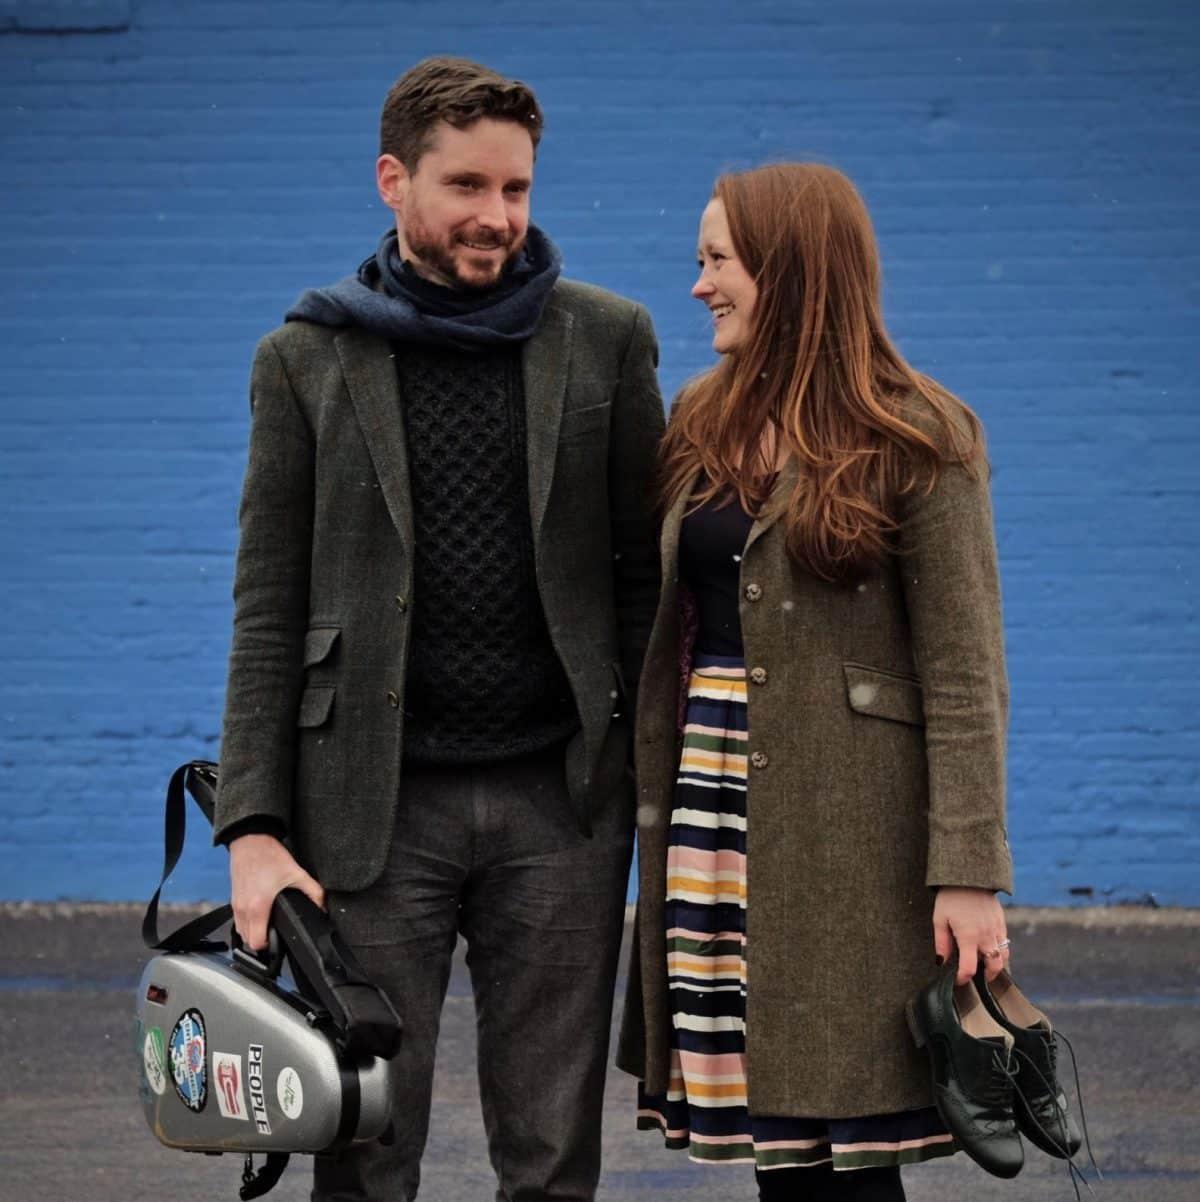 Danny Diamond and Anna Lethert